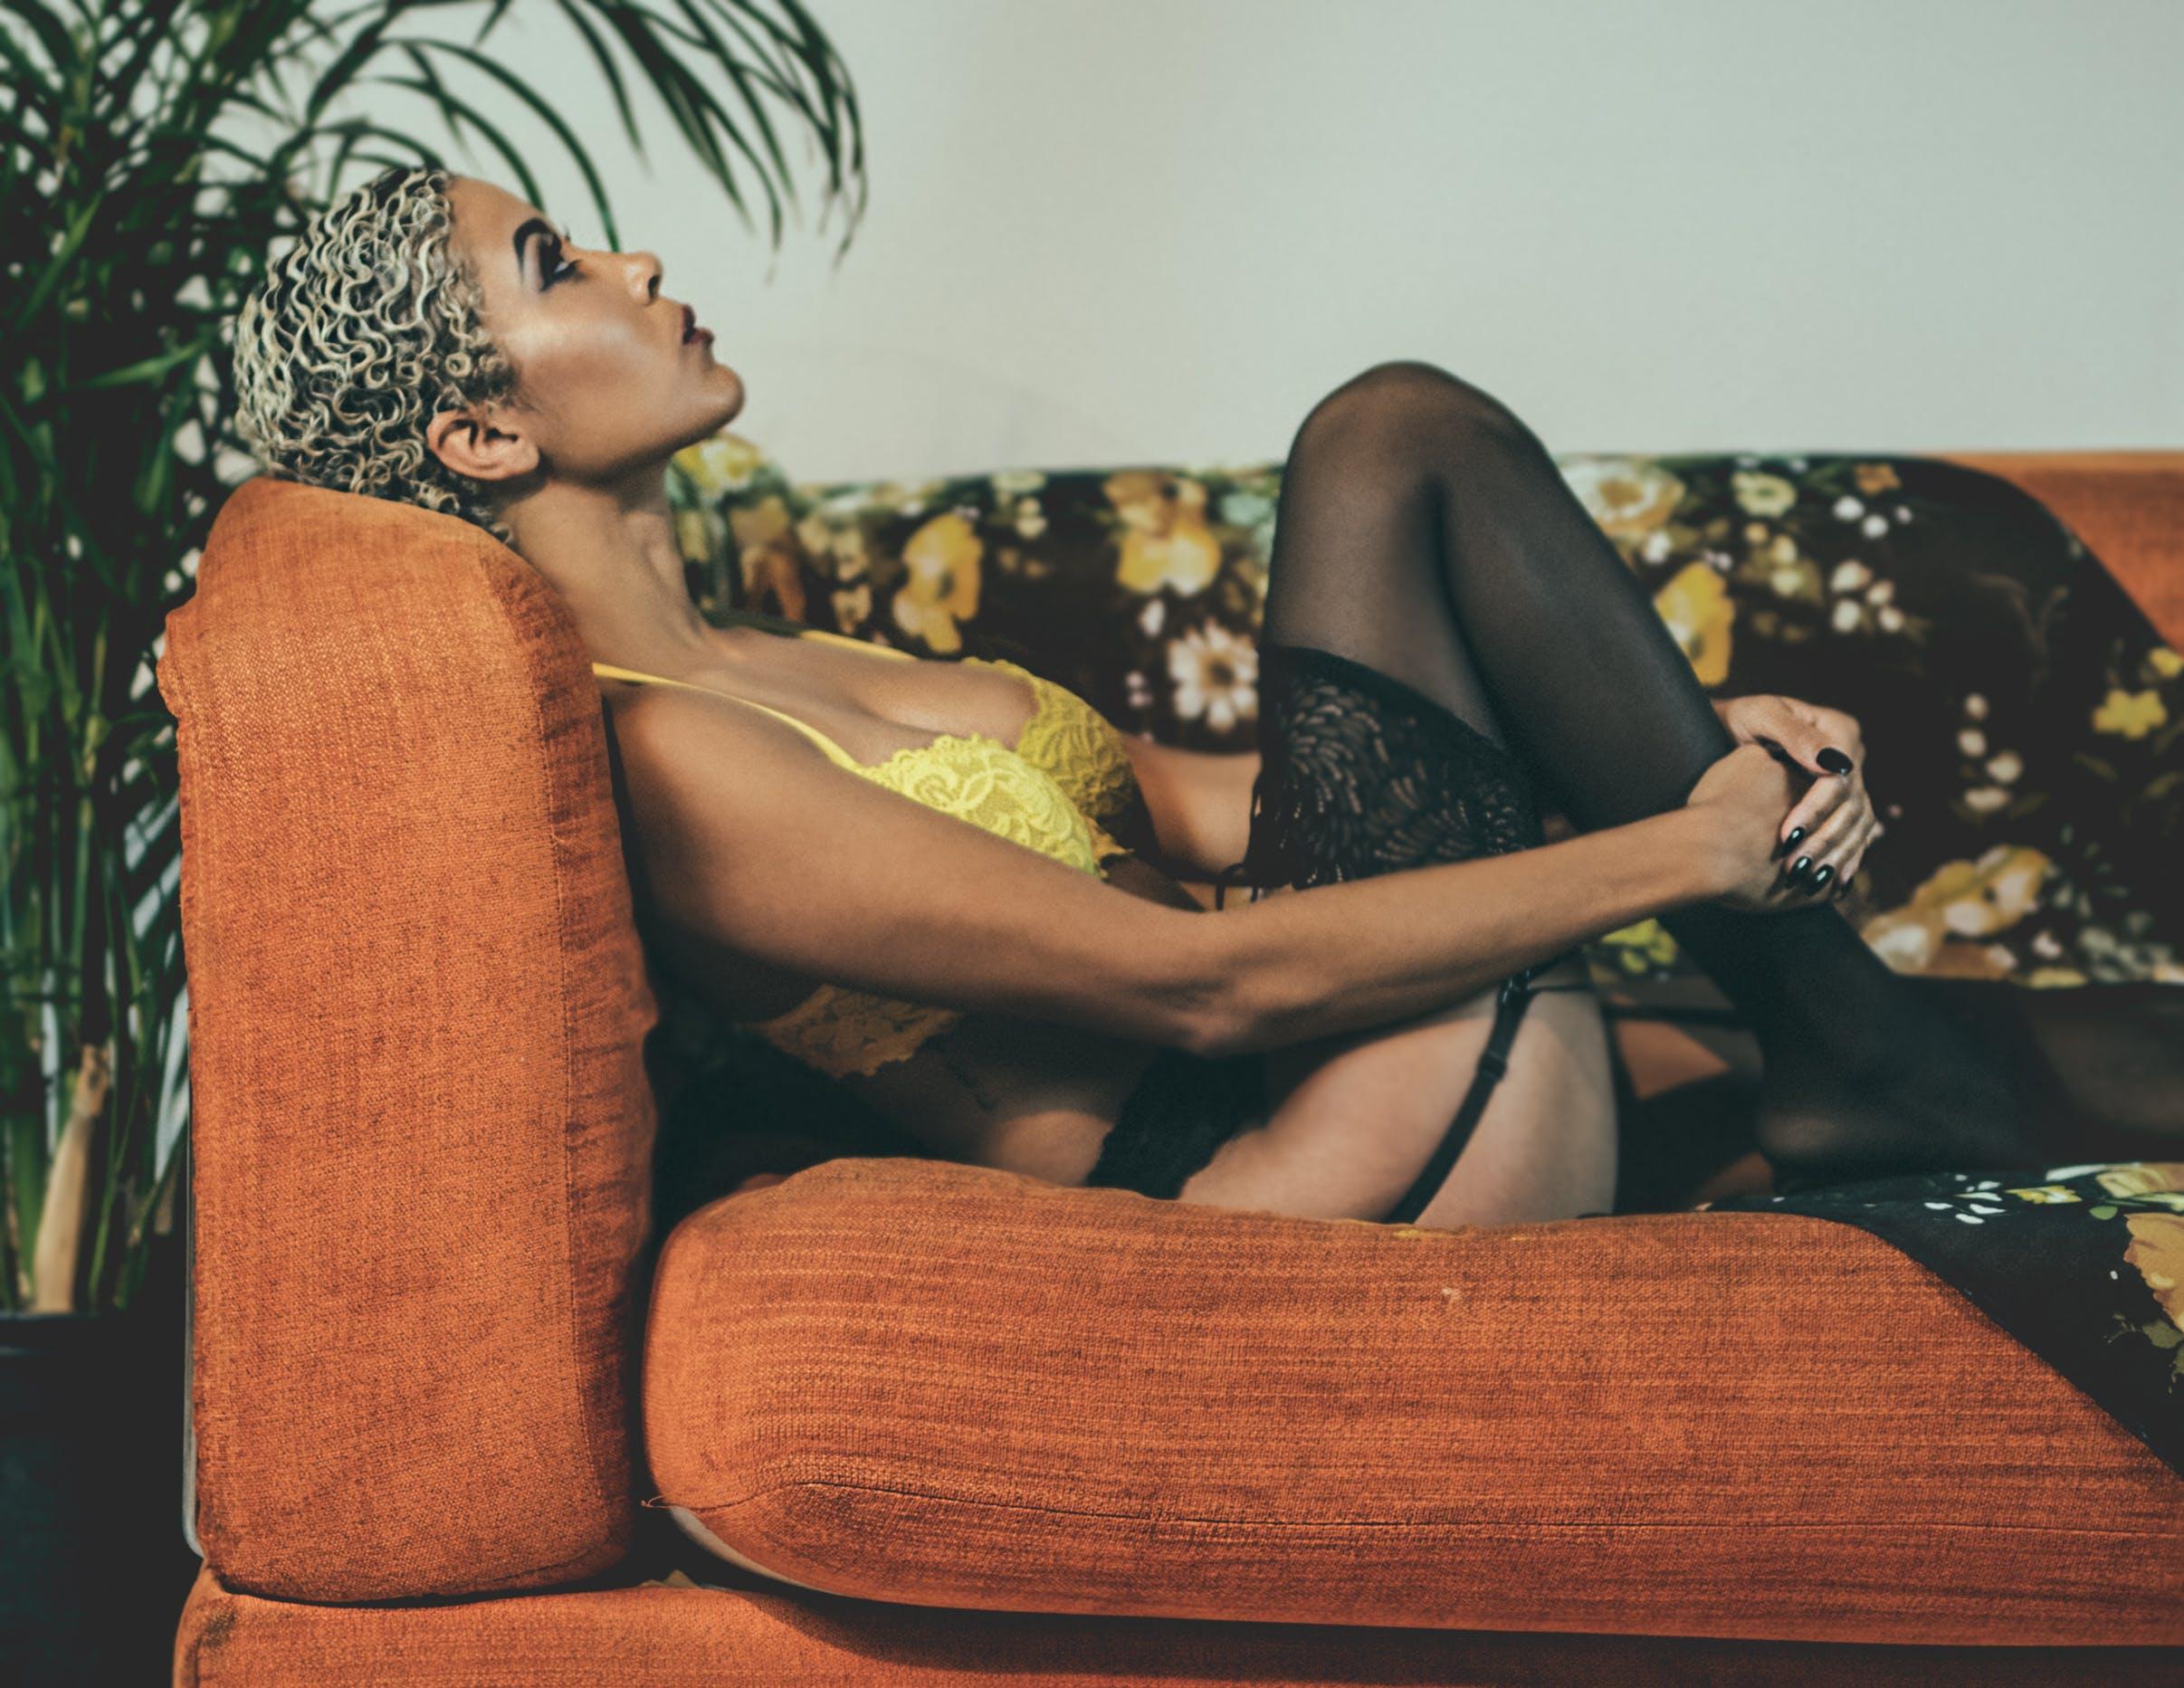 Woman Wearing Yellow Brassiere Sitting on Sofa